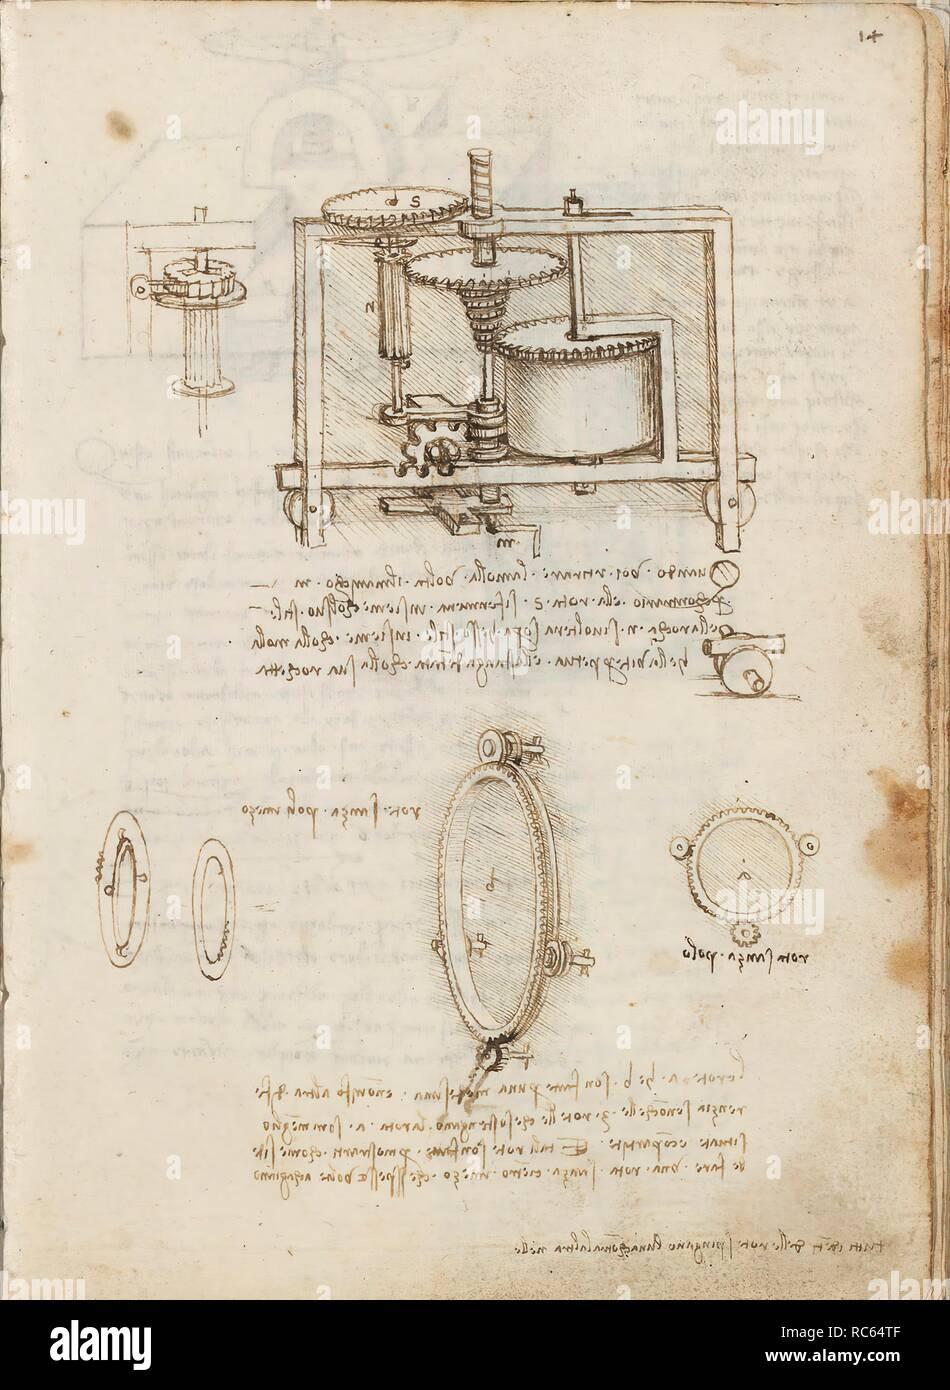 medium resolution of folio f 14r codex madrid i ms 8937 treaty of statics and mechanics 192 folios with 384 pages internal format 215 x 145 mm